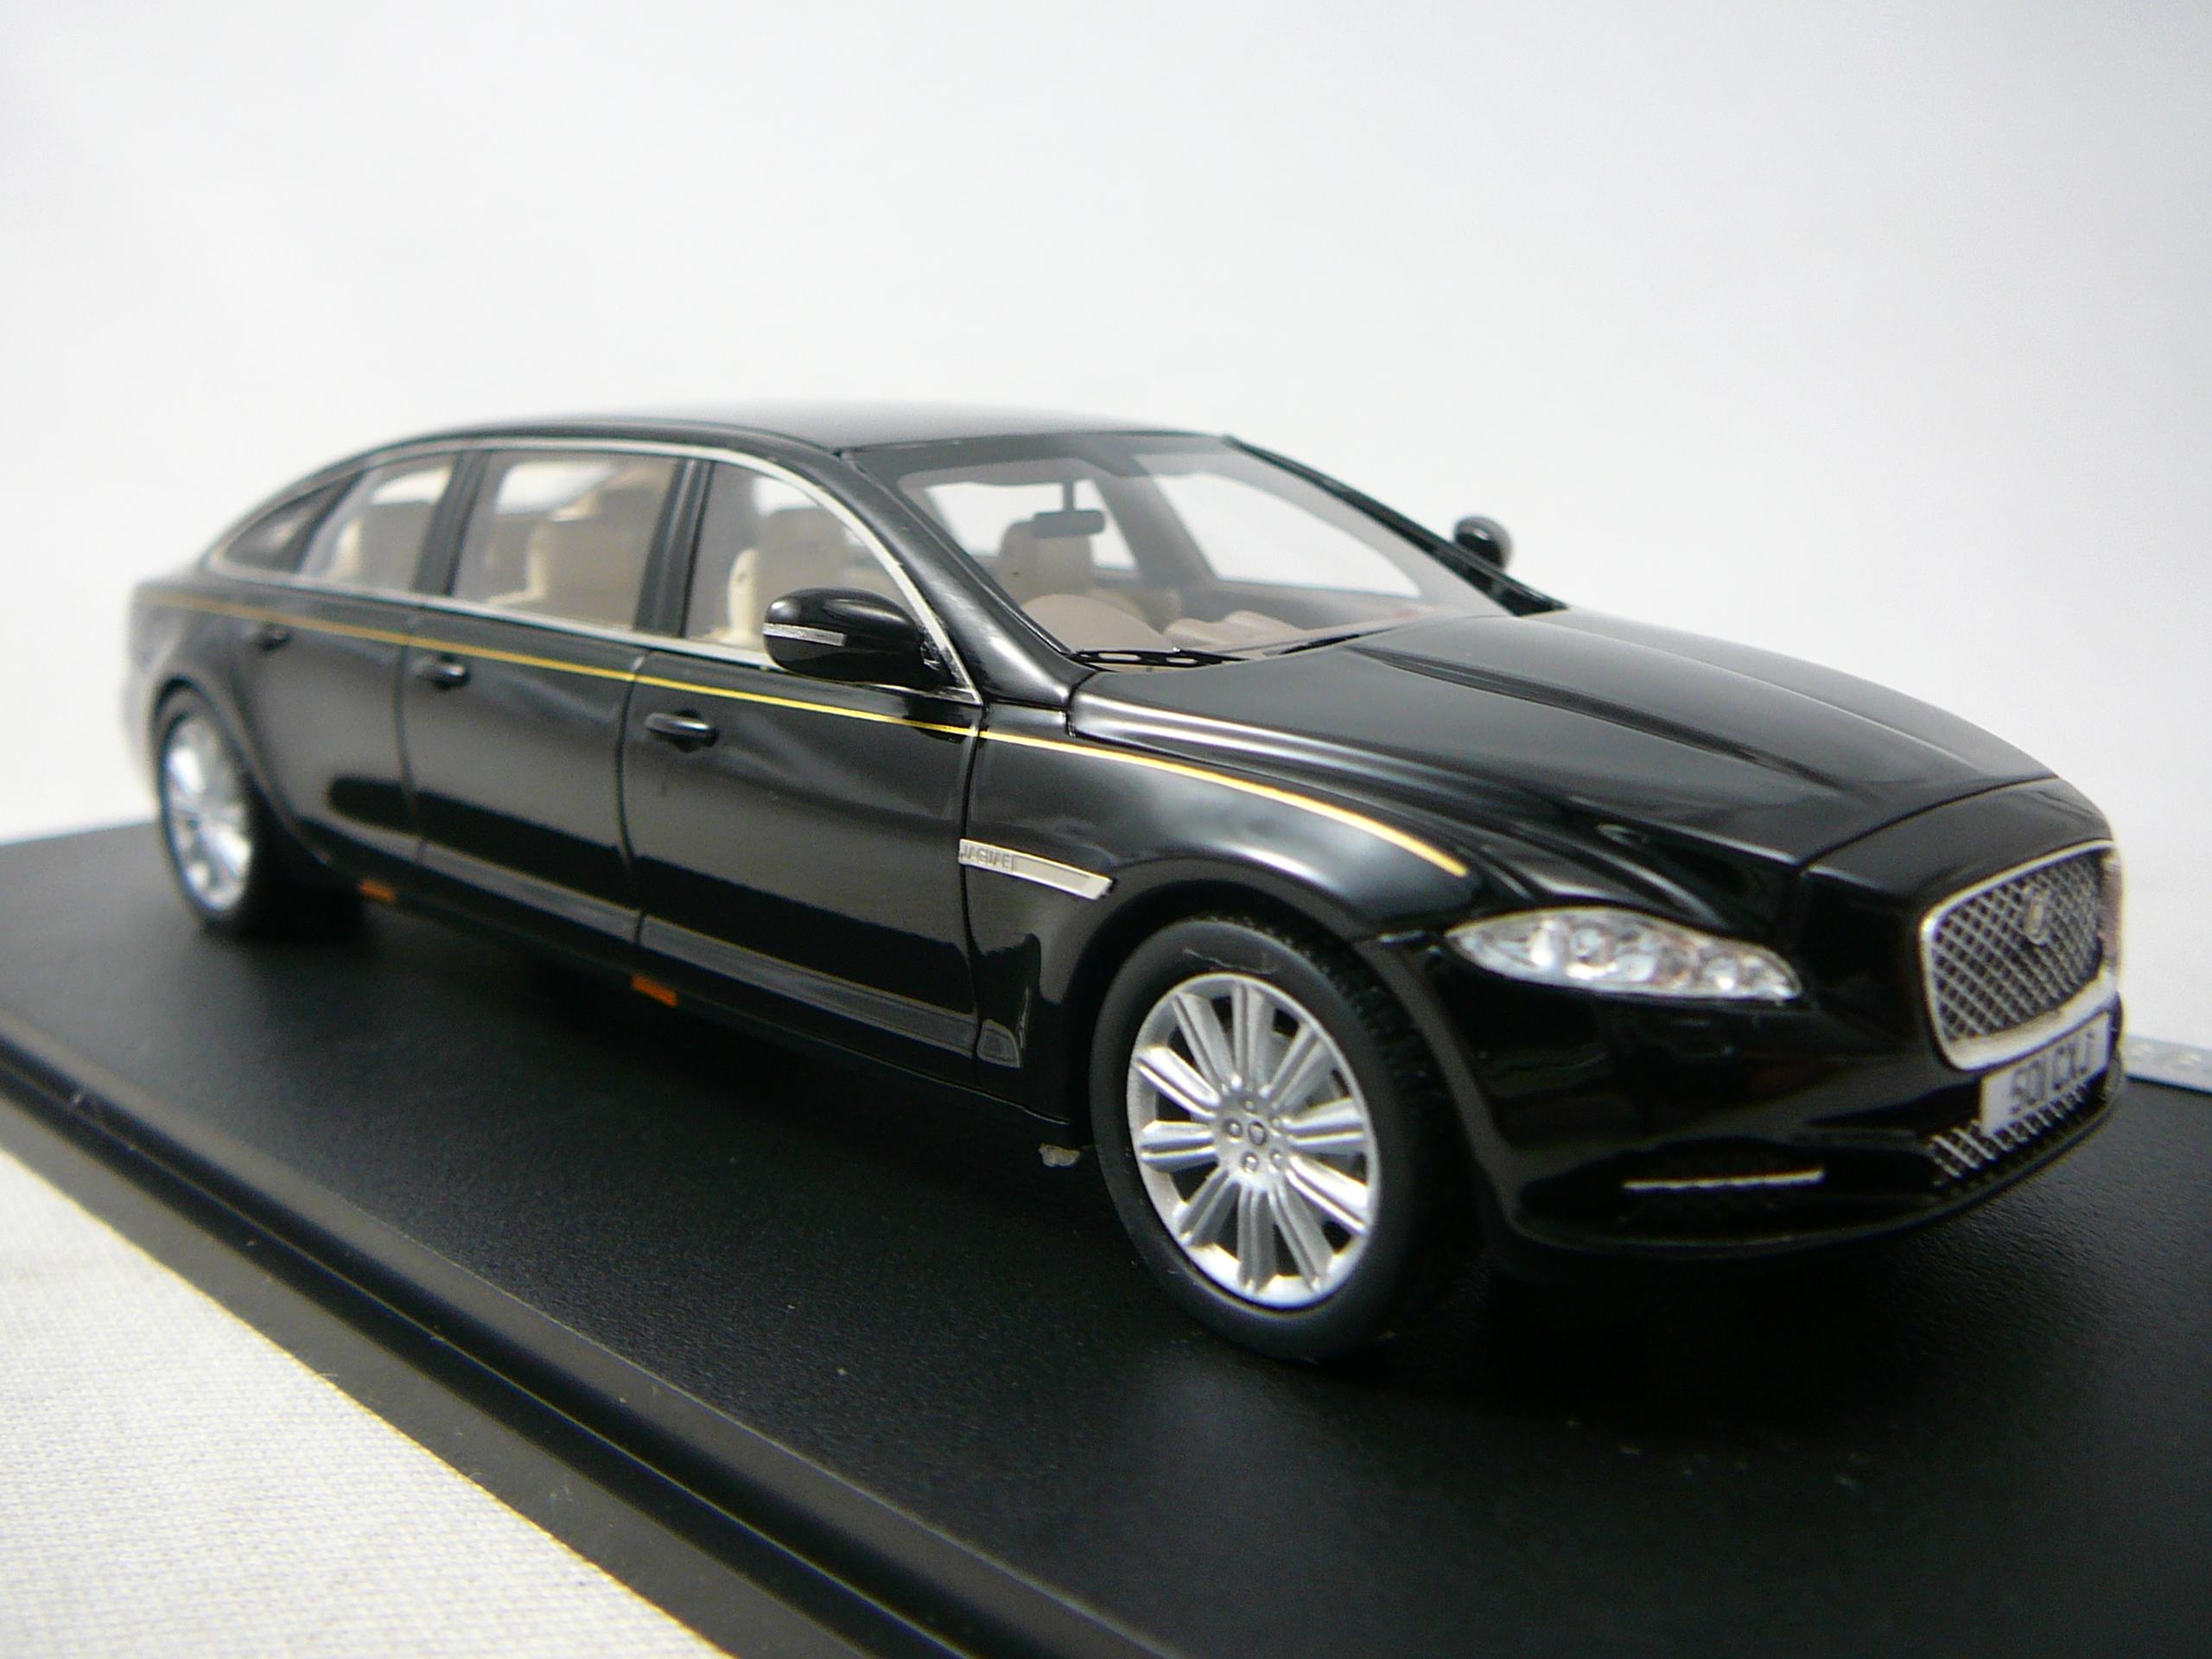 jaguar xj 351 wilcox limousine 6 portes miniature 1 43 glm glm 43213601 freeway01 voitures. Black Bedroom Furniture Sets. Home Design Ideas